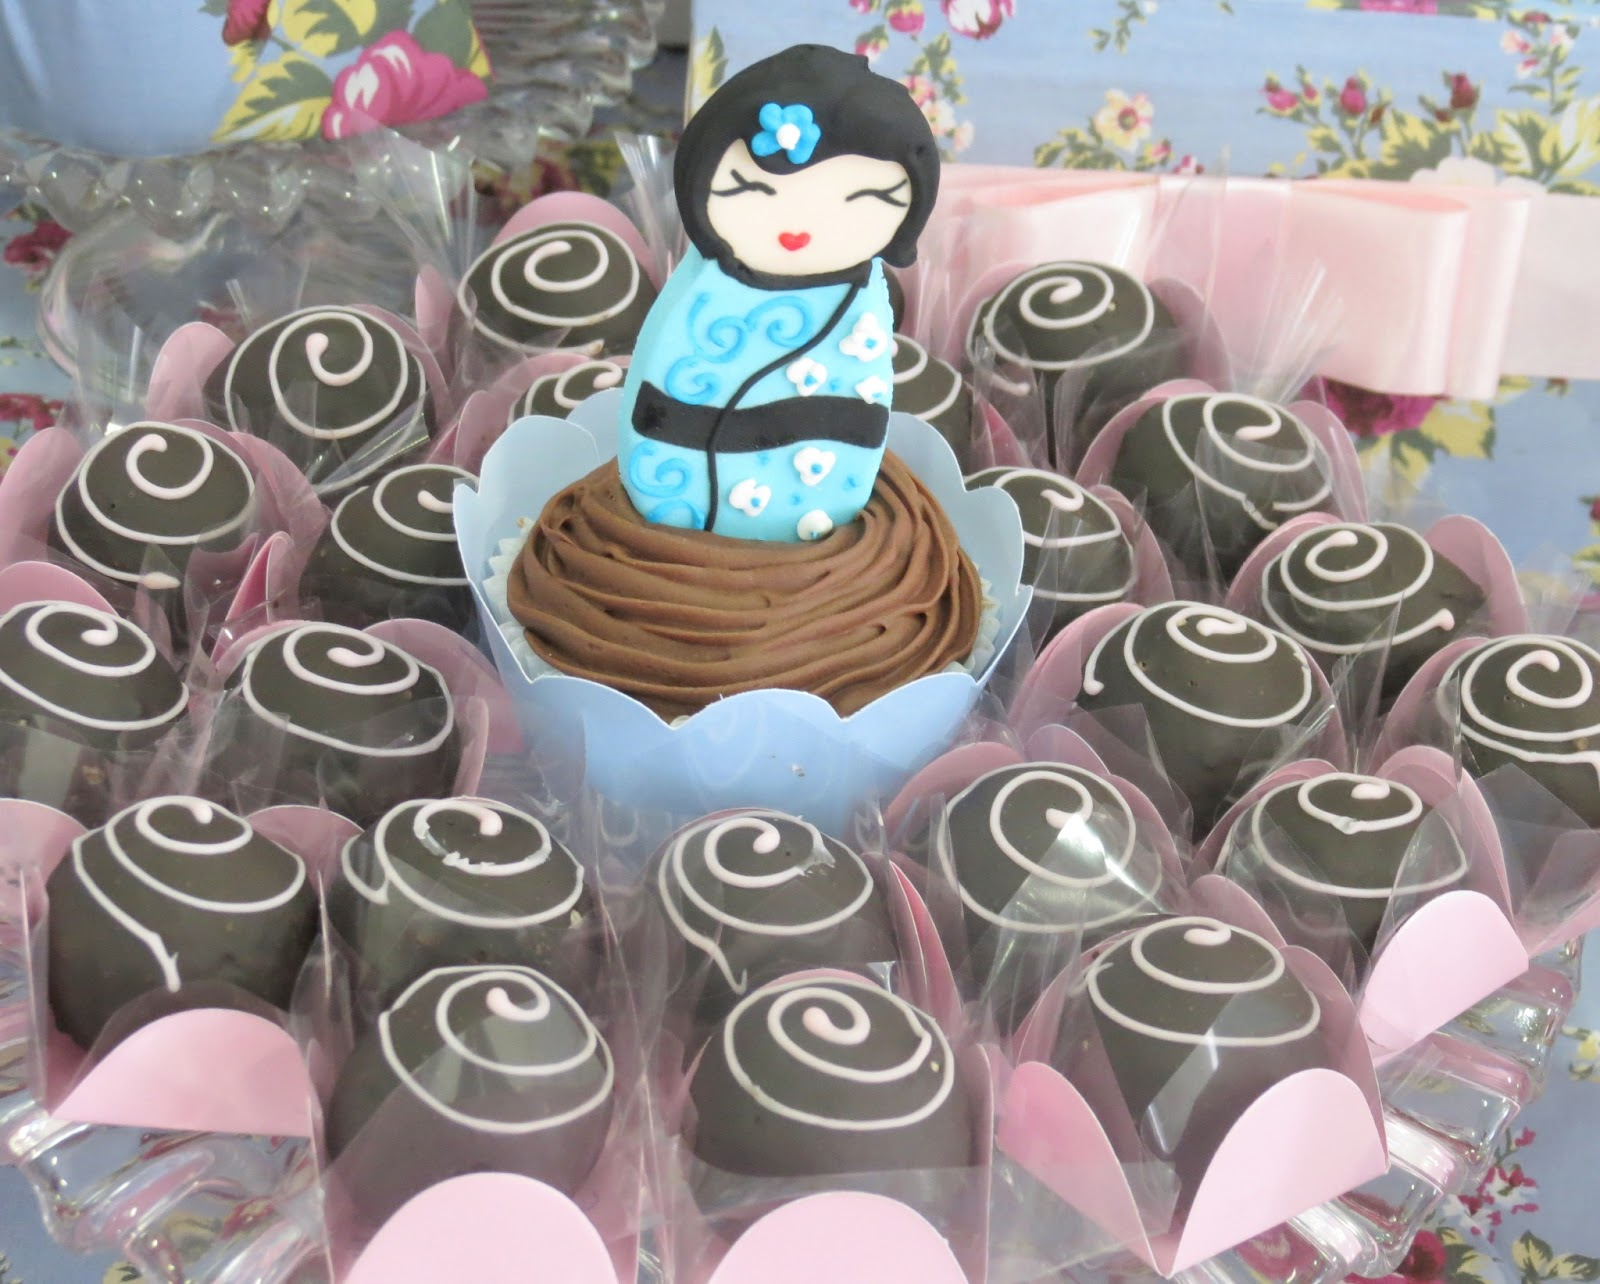 festa jardim japones:Festa Provençal – Site Oficial: Jardim de Japonês!!